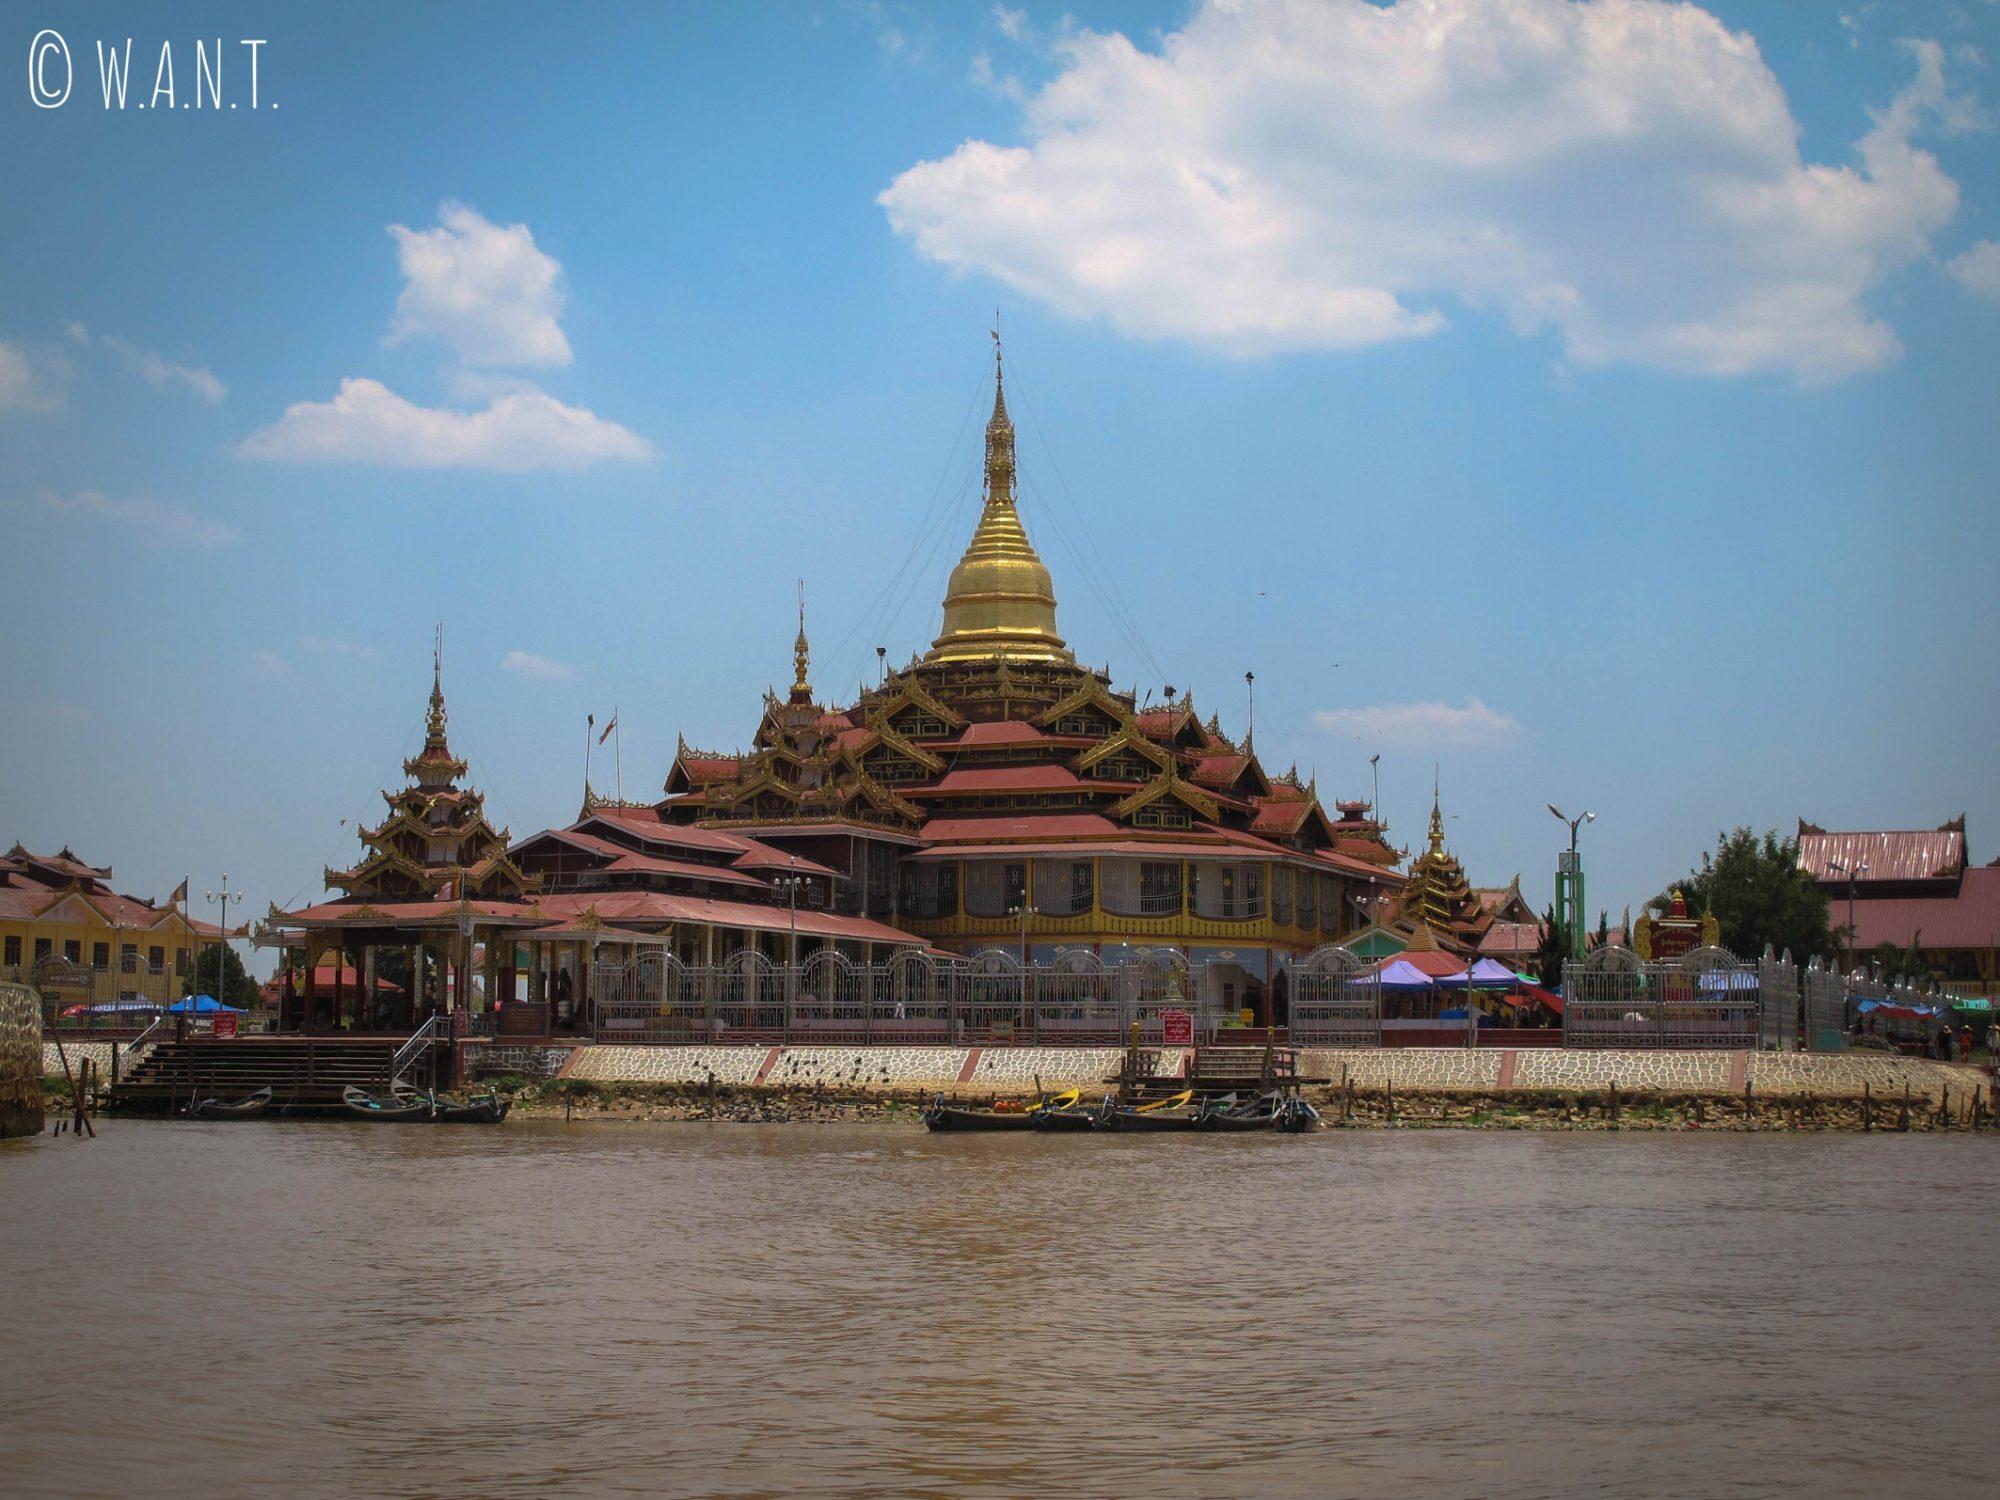 Vue sur la Pagode Phaung Daw Oo